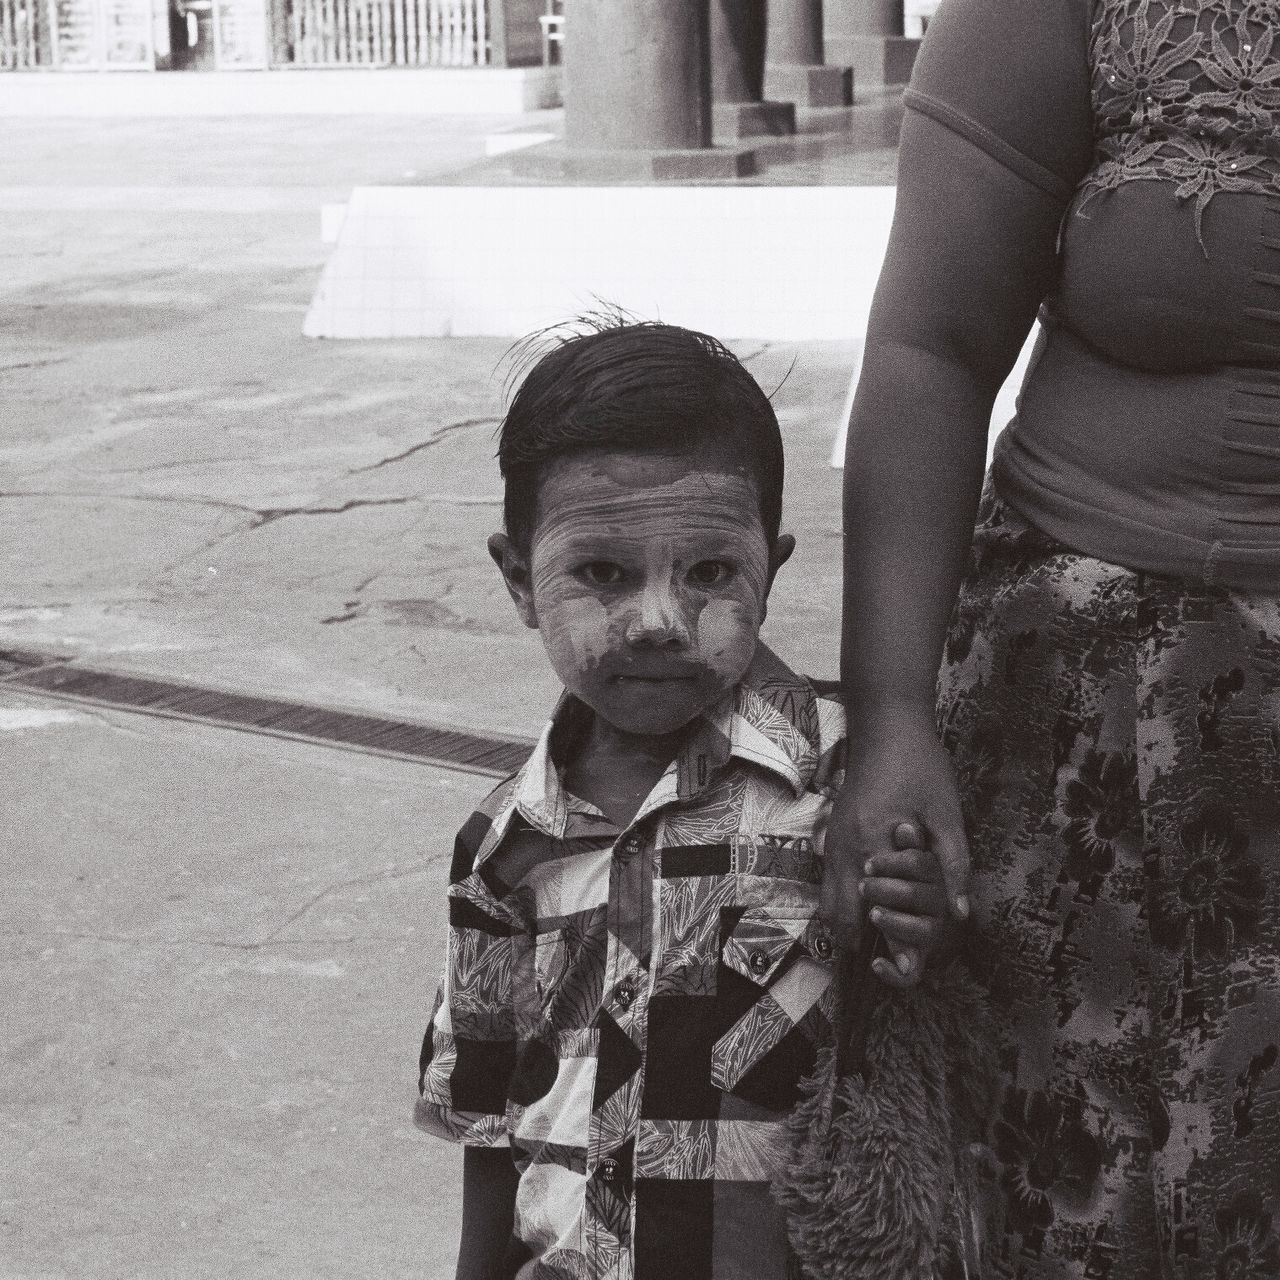 The Portraitist - 2017 EyeEm Awards The Photojournalist - 2017 EyeEm Awards The Street Photographer - 2017 EyeEm Awards Child Real People Travel Destinations Black And White Backandwhite Ishootfilm Iusefilm 35mm Ilford FP4 Plus Myanmar Lifestyles